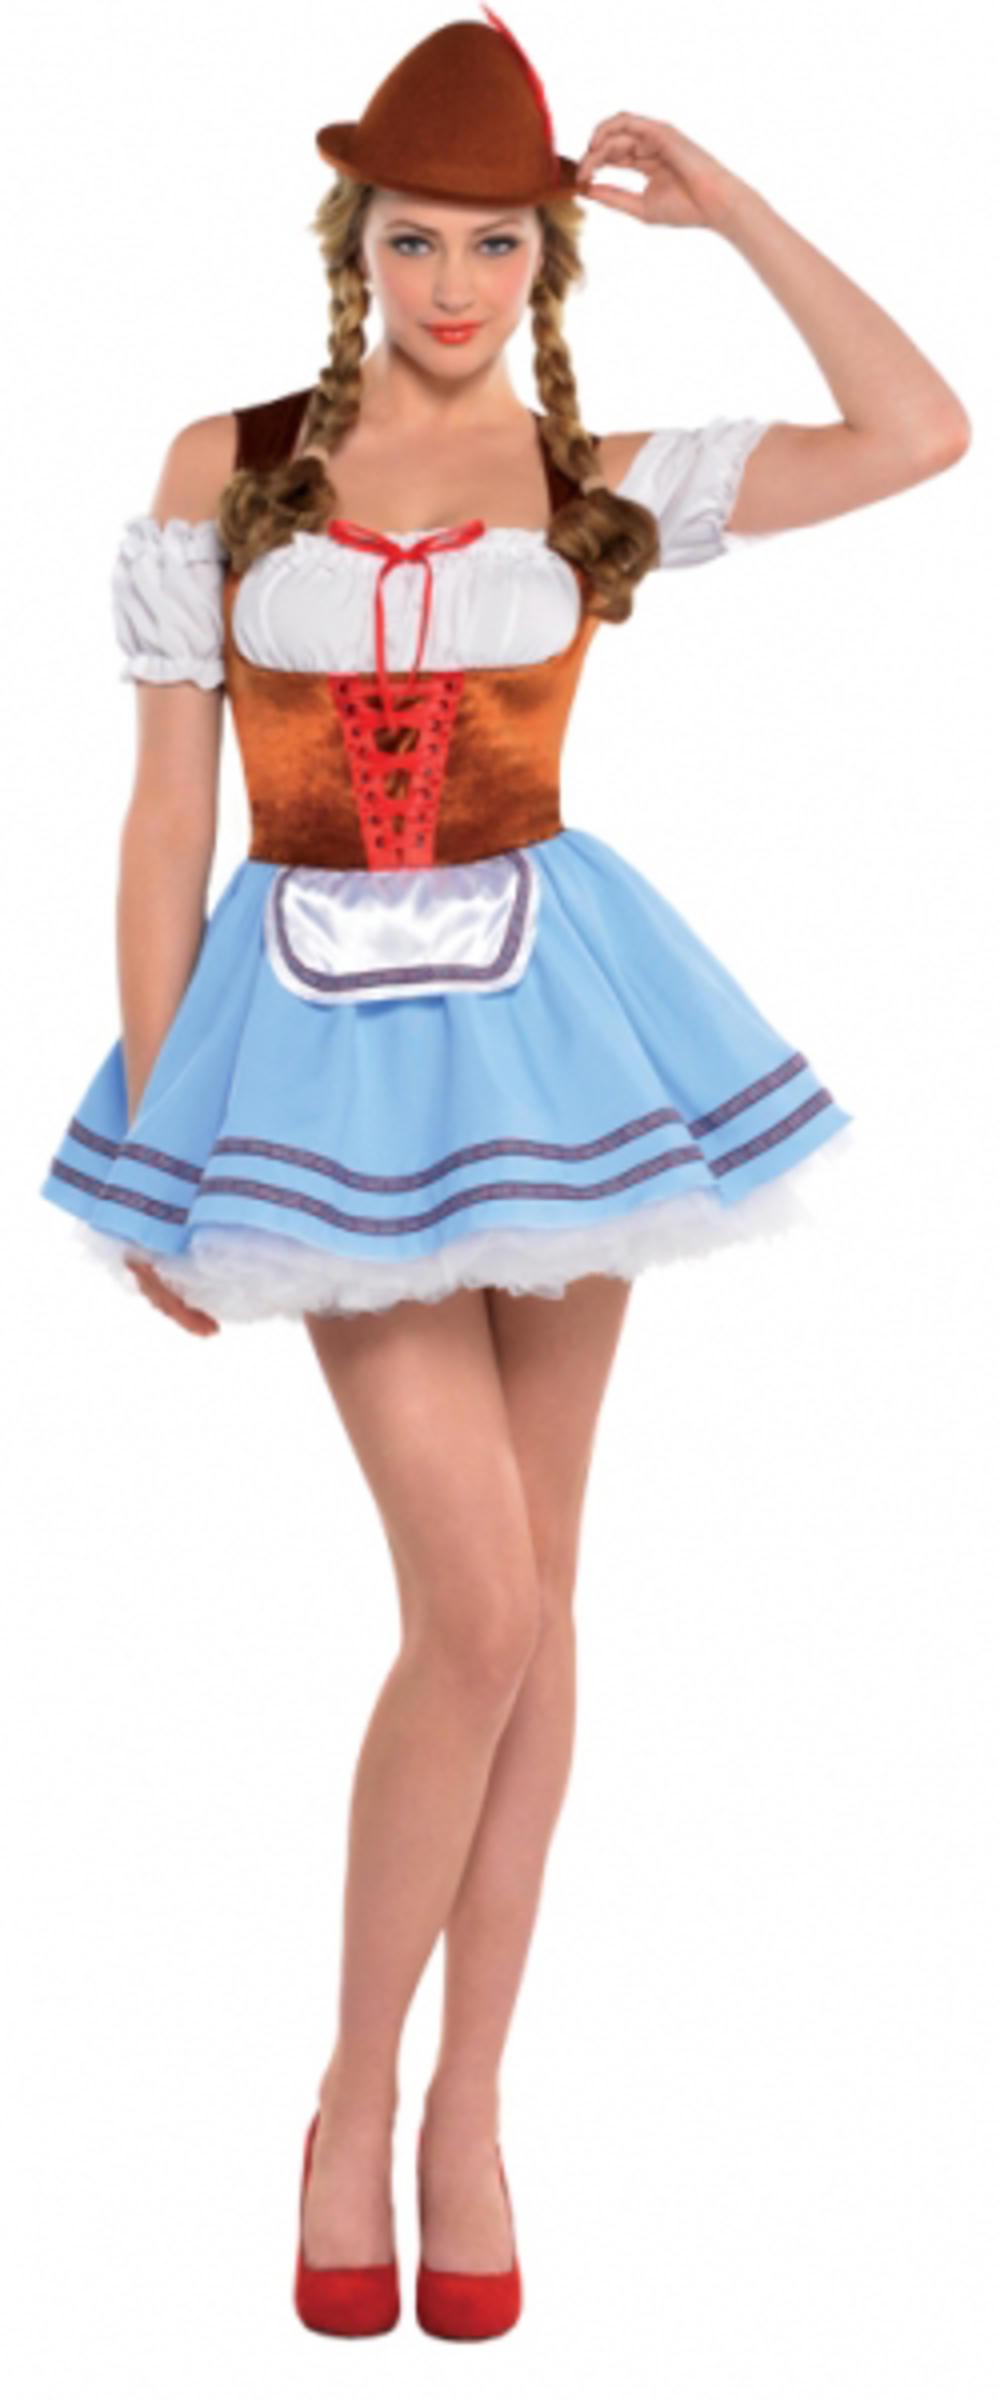 Oktoberfest Durandal Ladies Costume German Bavarian Beer Maid Adults Costume